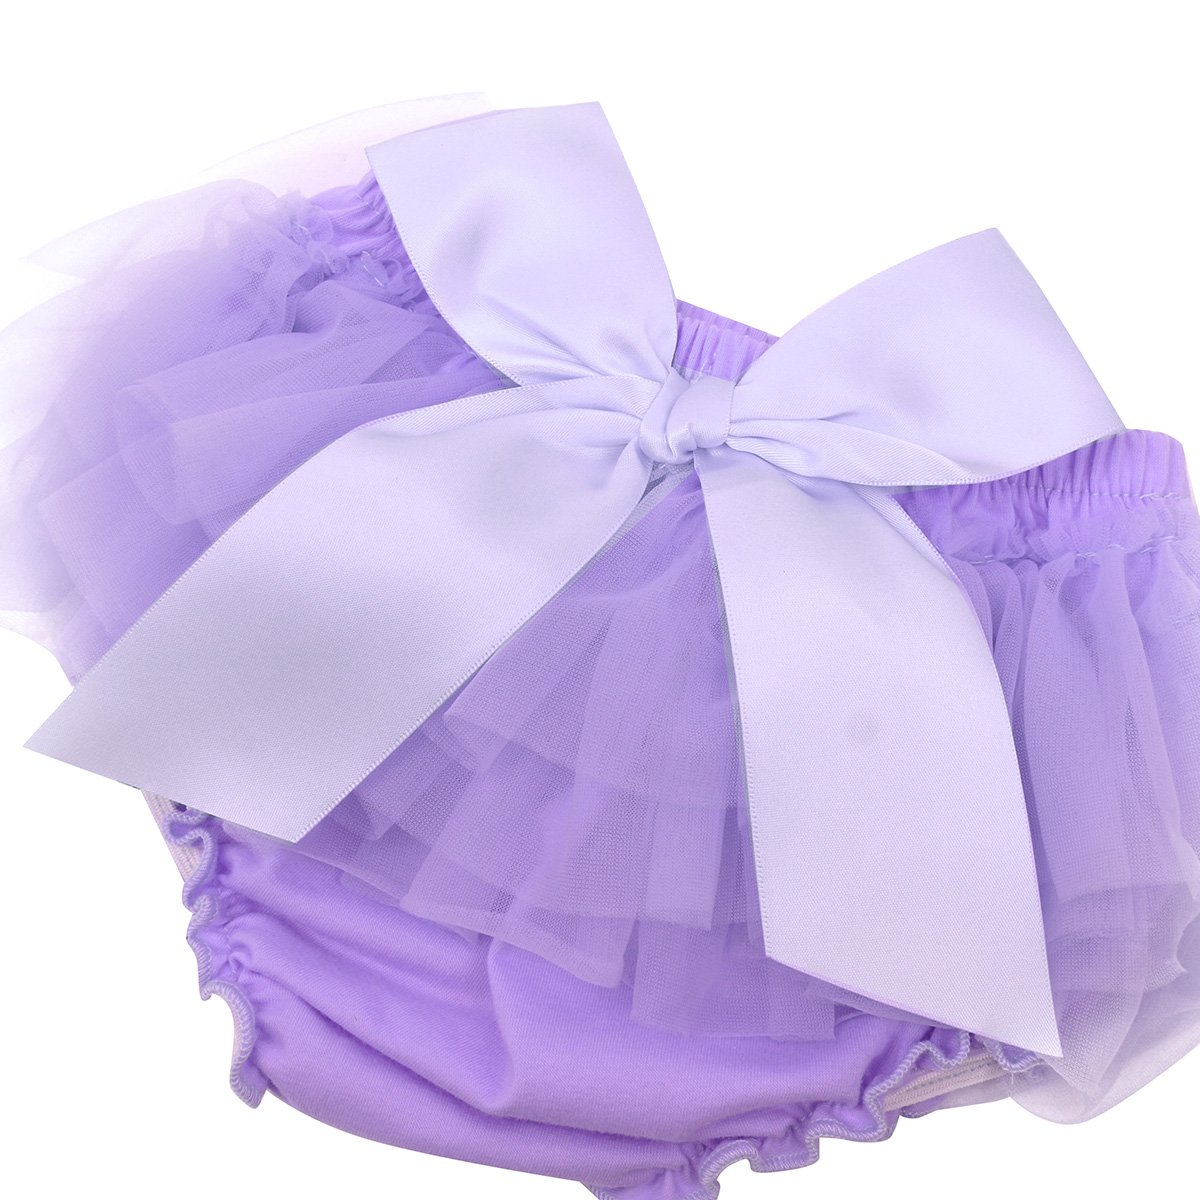 Headband Set Newborn Photo Prop 1st Birthday Outfits Freebily Baby Girls Bowknot Ruffle Bloomer Diaper Covers